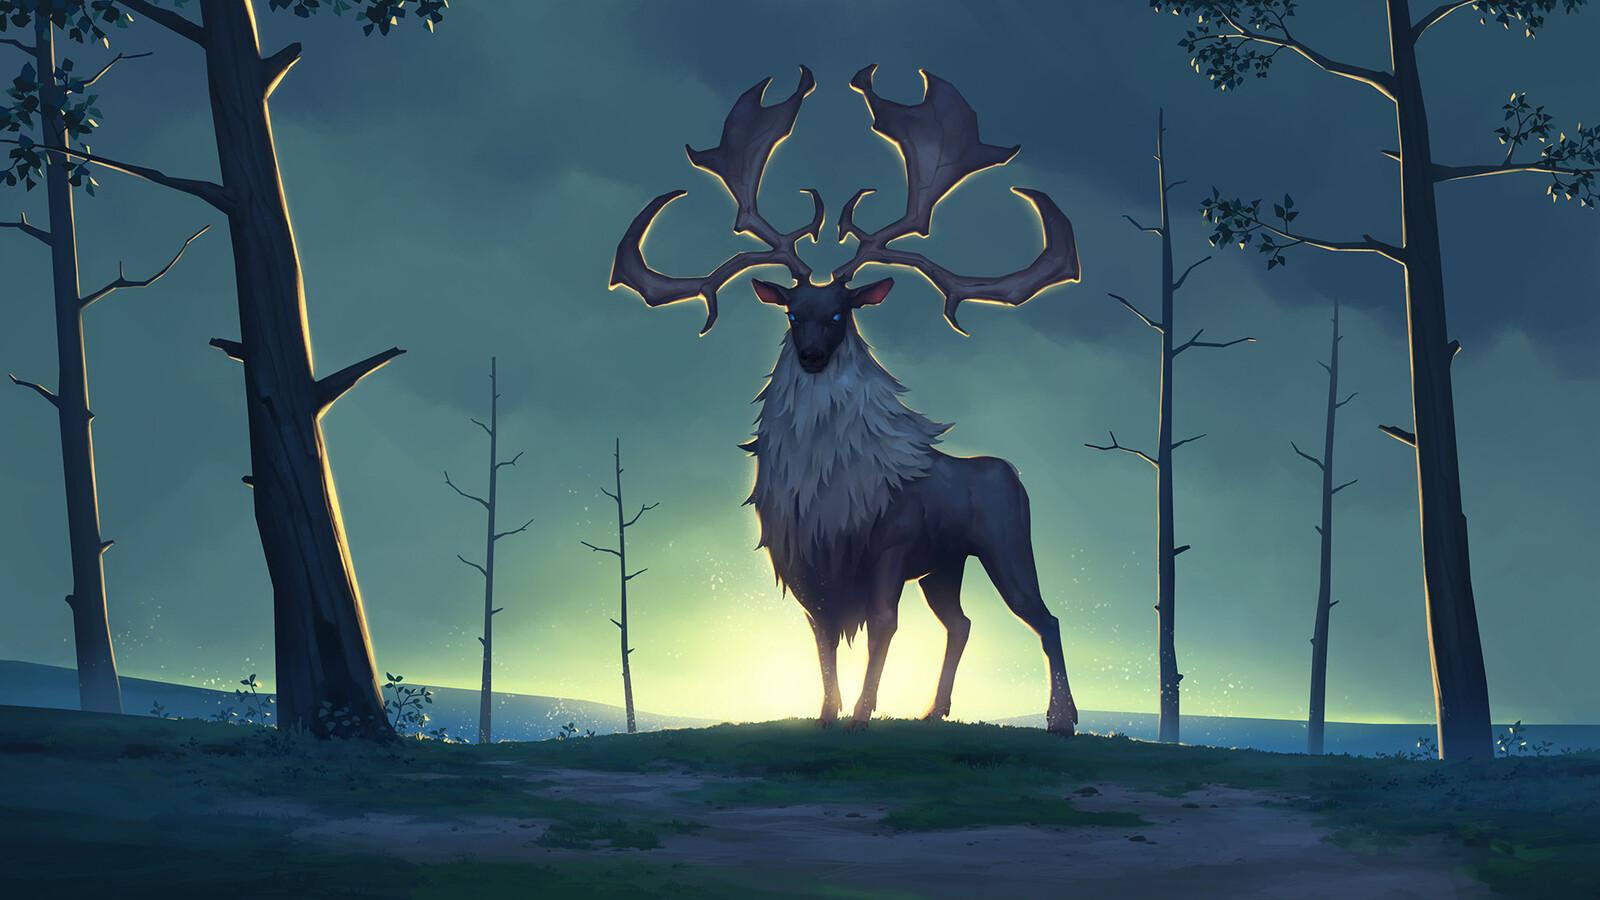 the amazing reference image, from Jeremy Vitry